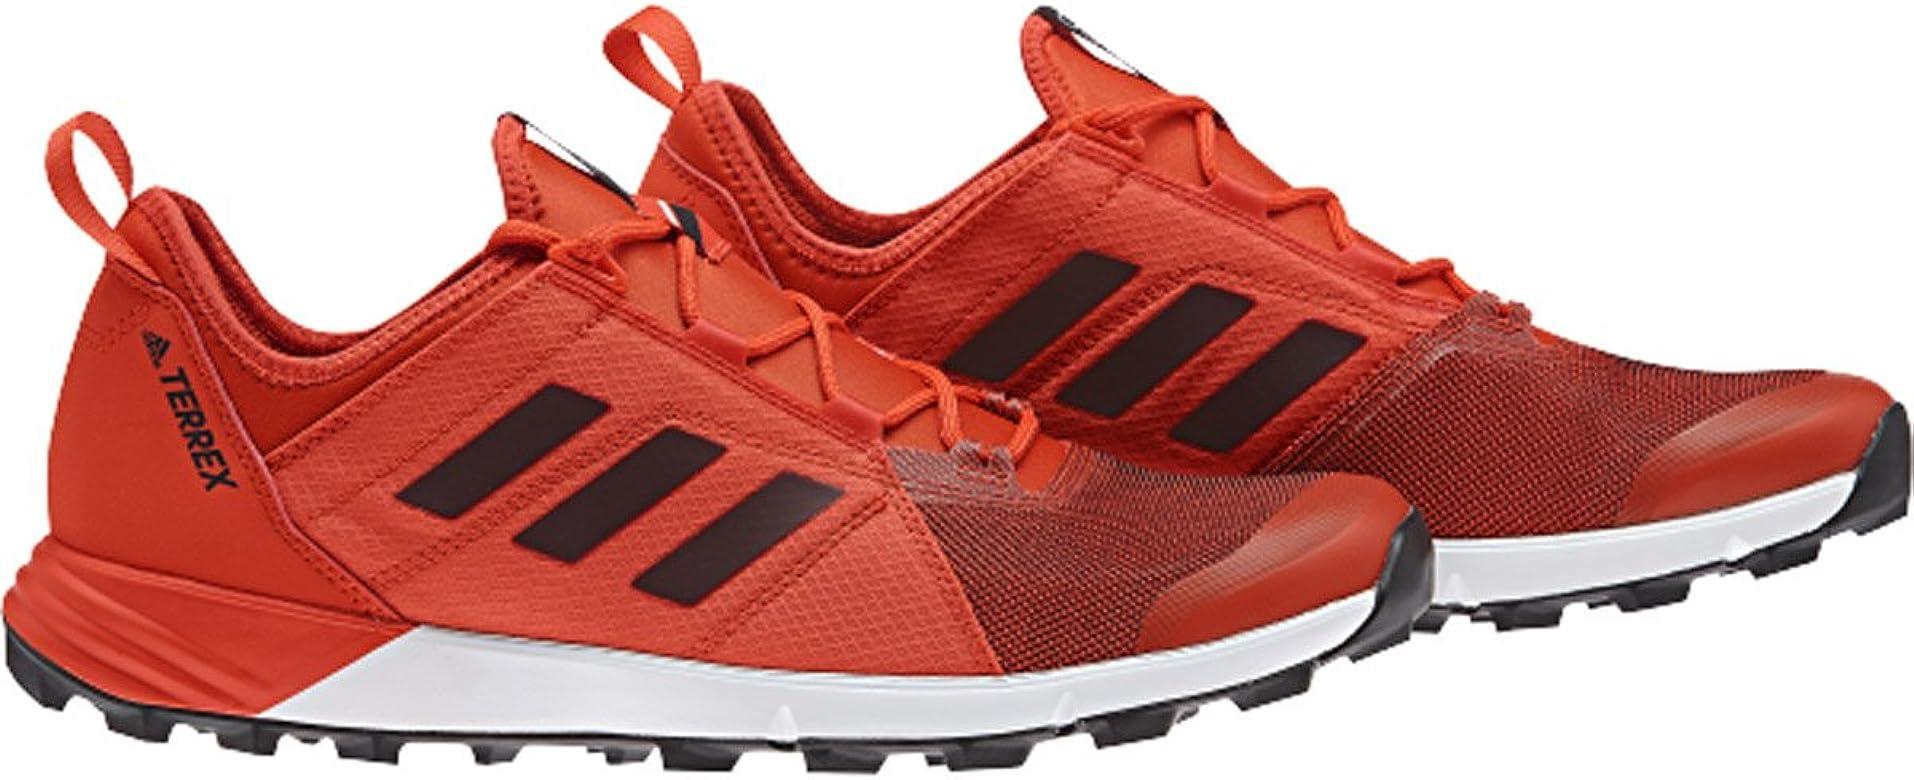 Reposición técnico Hacer las tareas domésticas  Amazon.com | Adidas Sport Performance Mens Terrex Agravic Speed Athletic  Sneakers, Red Textile, Rubber, 10 M | Trail Running